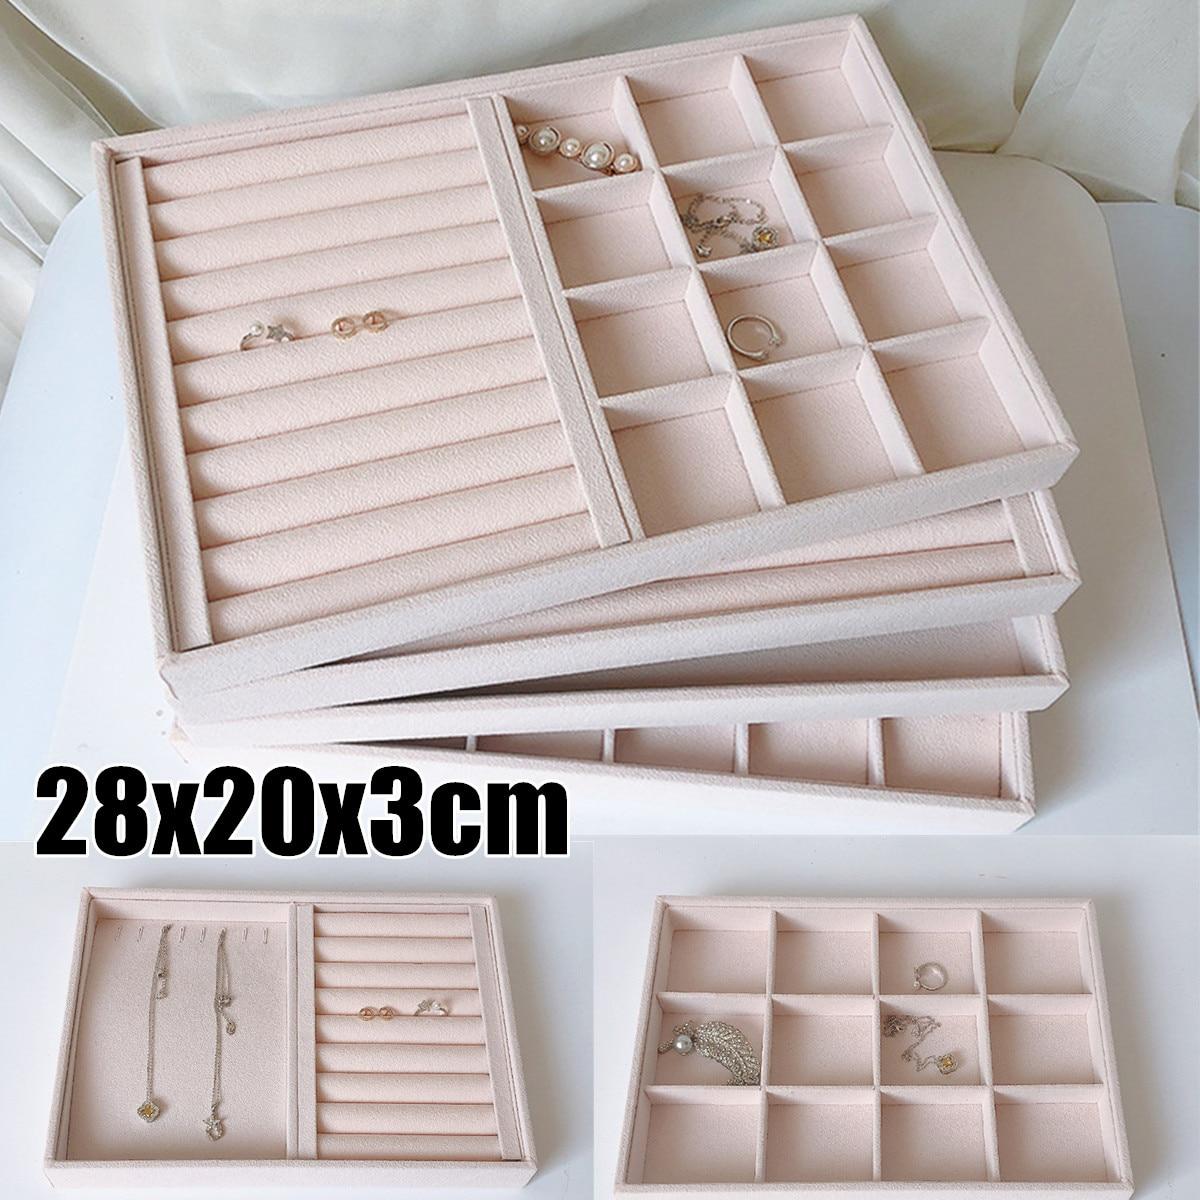 Pink Velvet Jewelry Ring Display Organizer Case Tray Holder Necklace Earrings Bangle Storage Box Sho